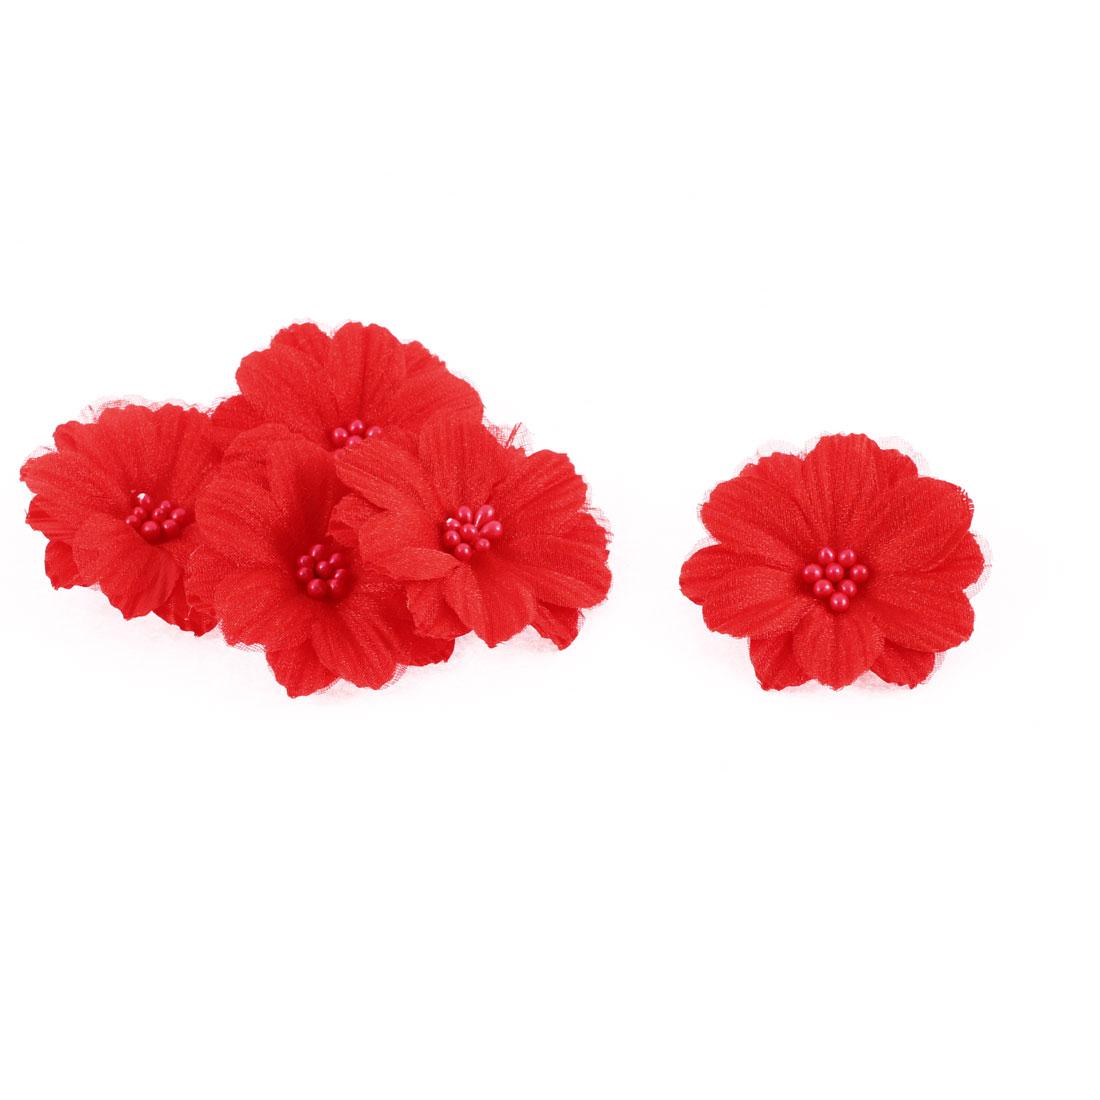 "Party Wedding Bride Dress Decoration Artificial Flower Red 2"" Dia 5pcs"